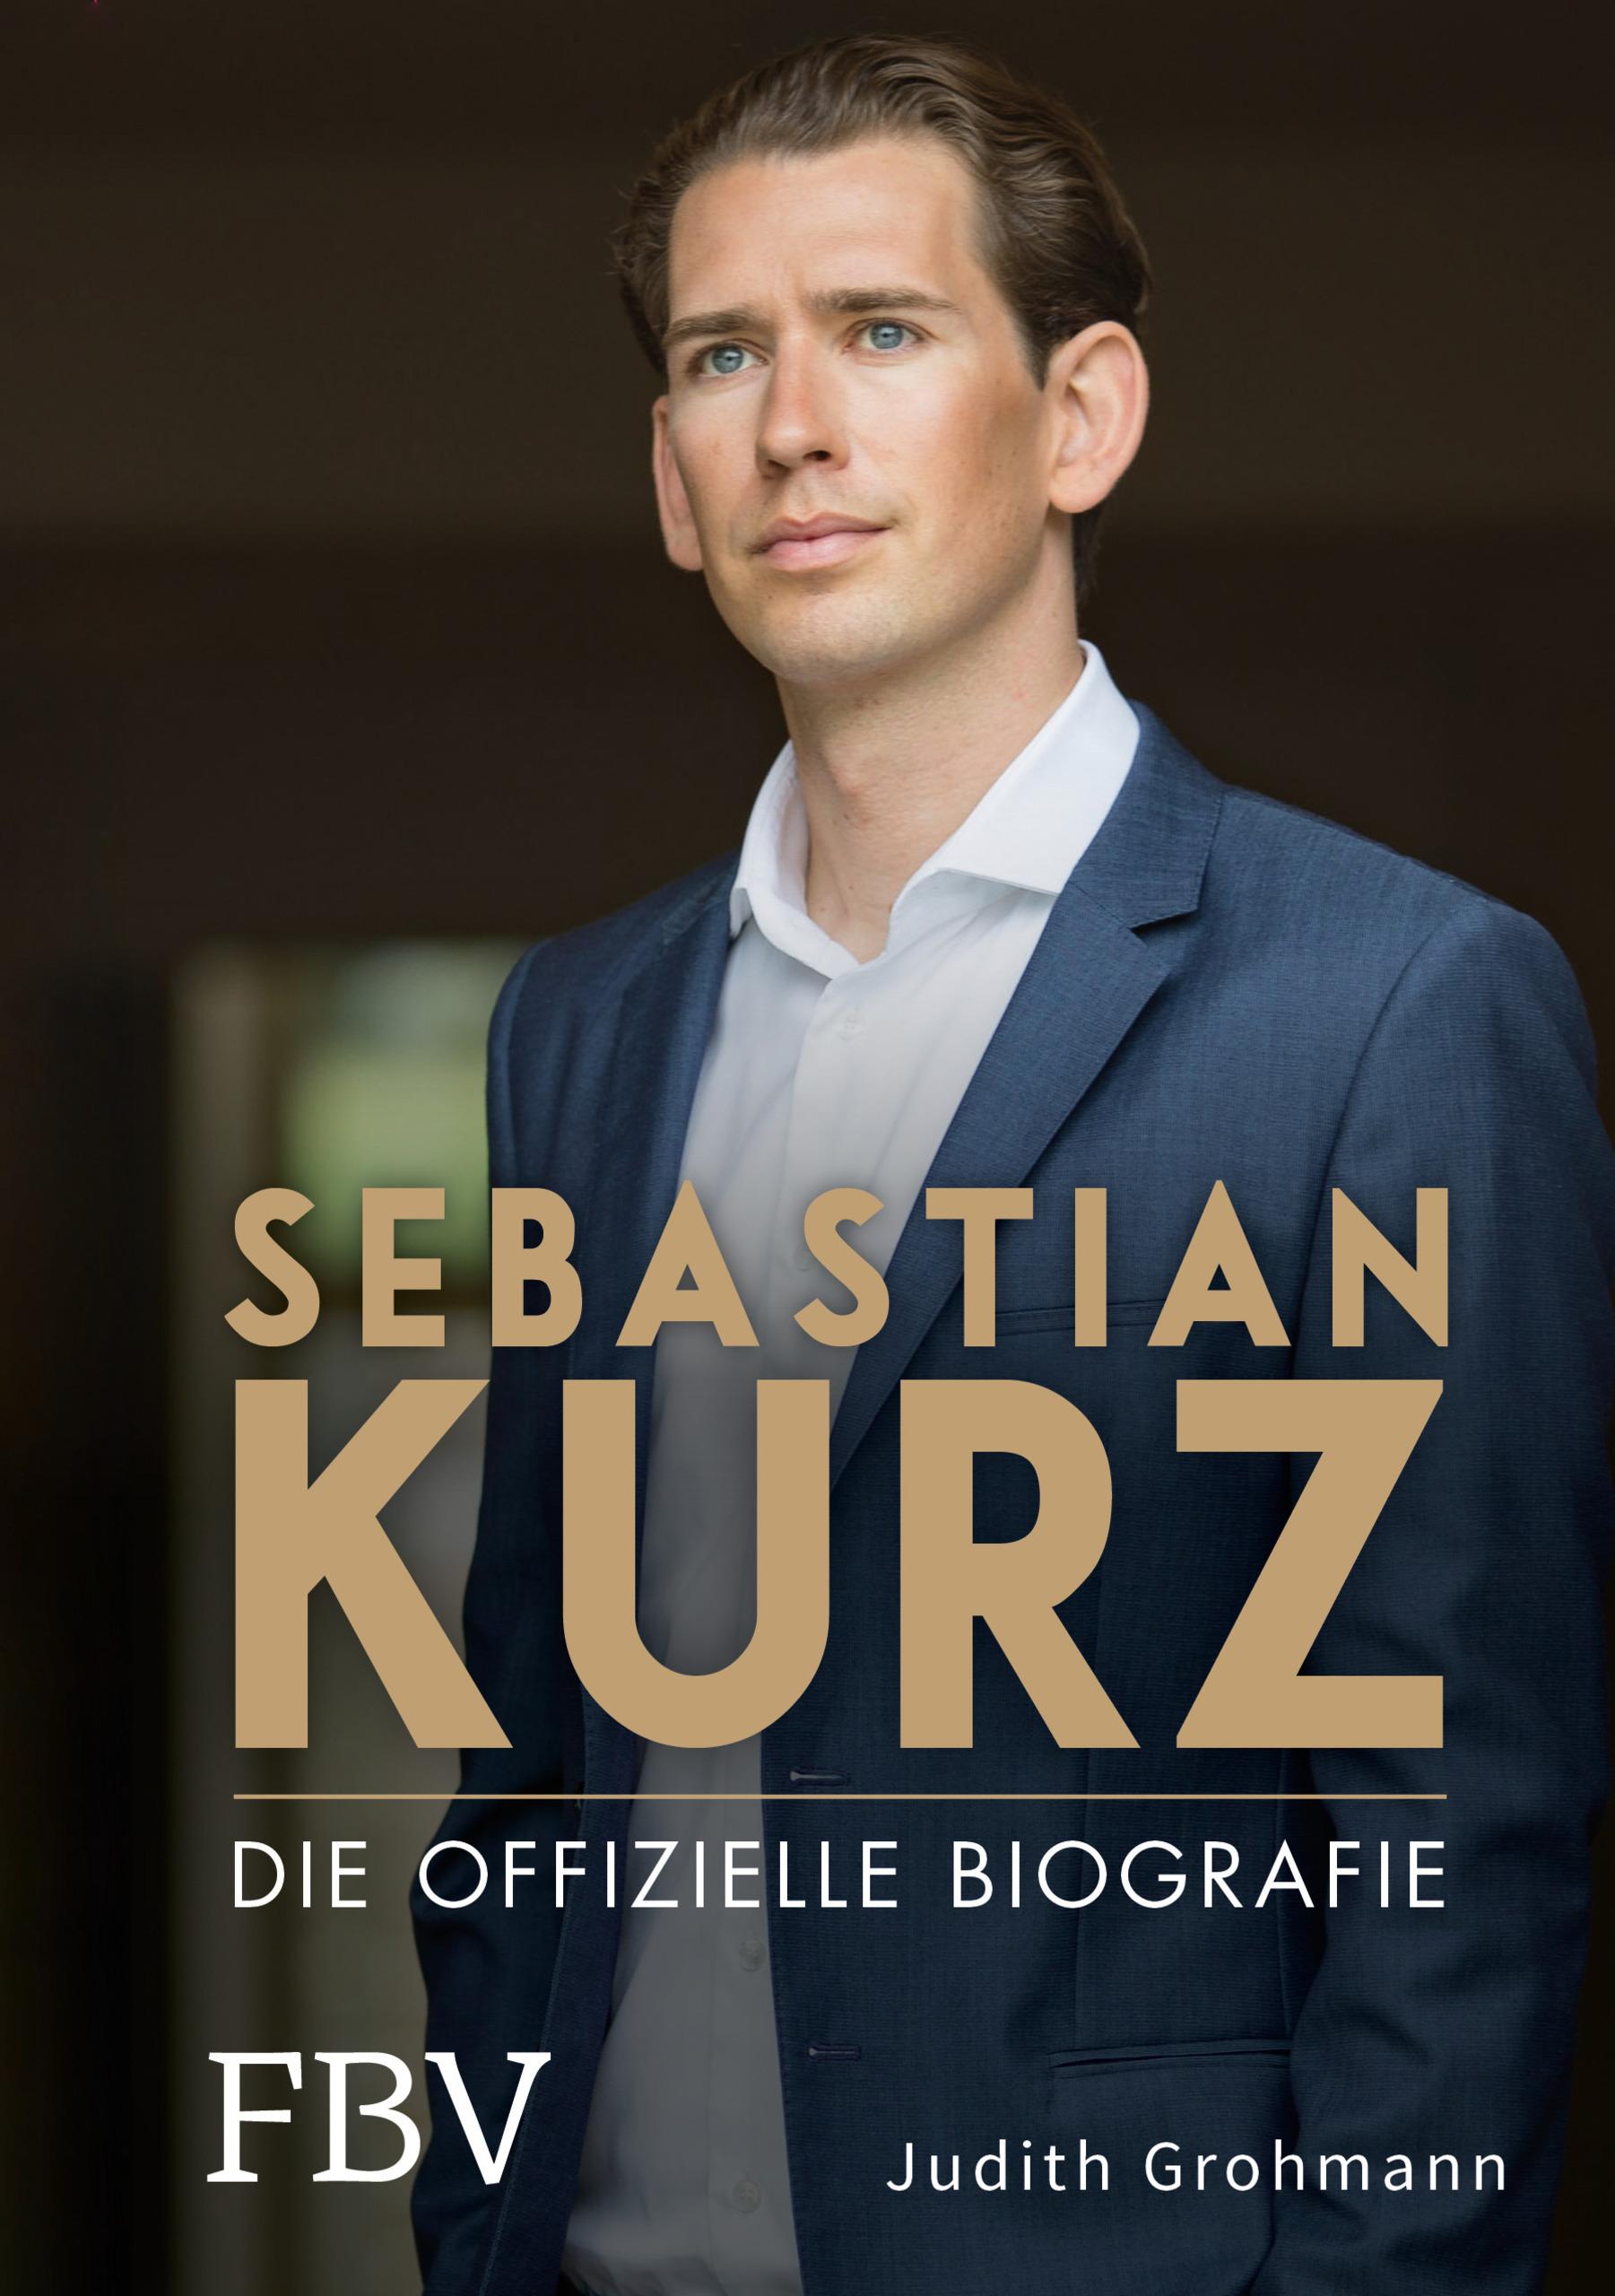 Sebastian Kurz - Die offizielle Biografie - Cover